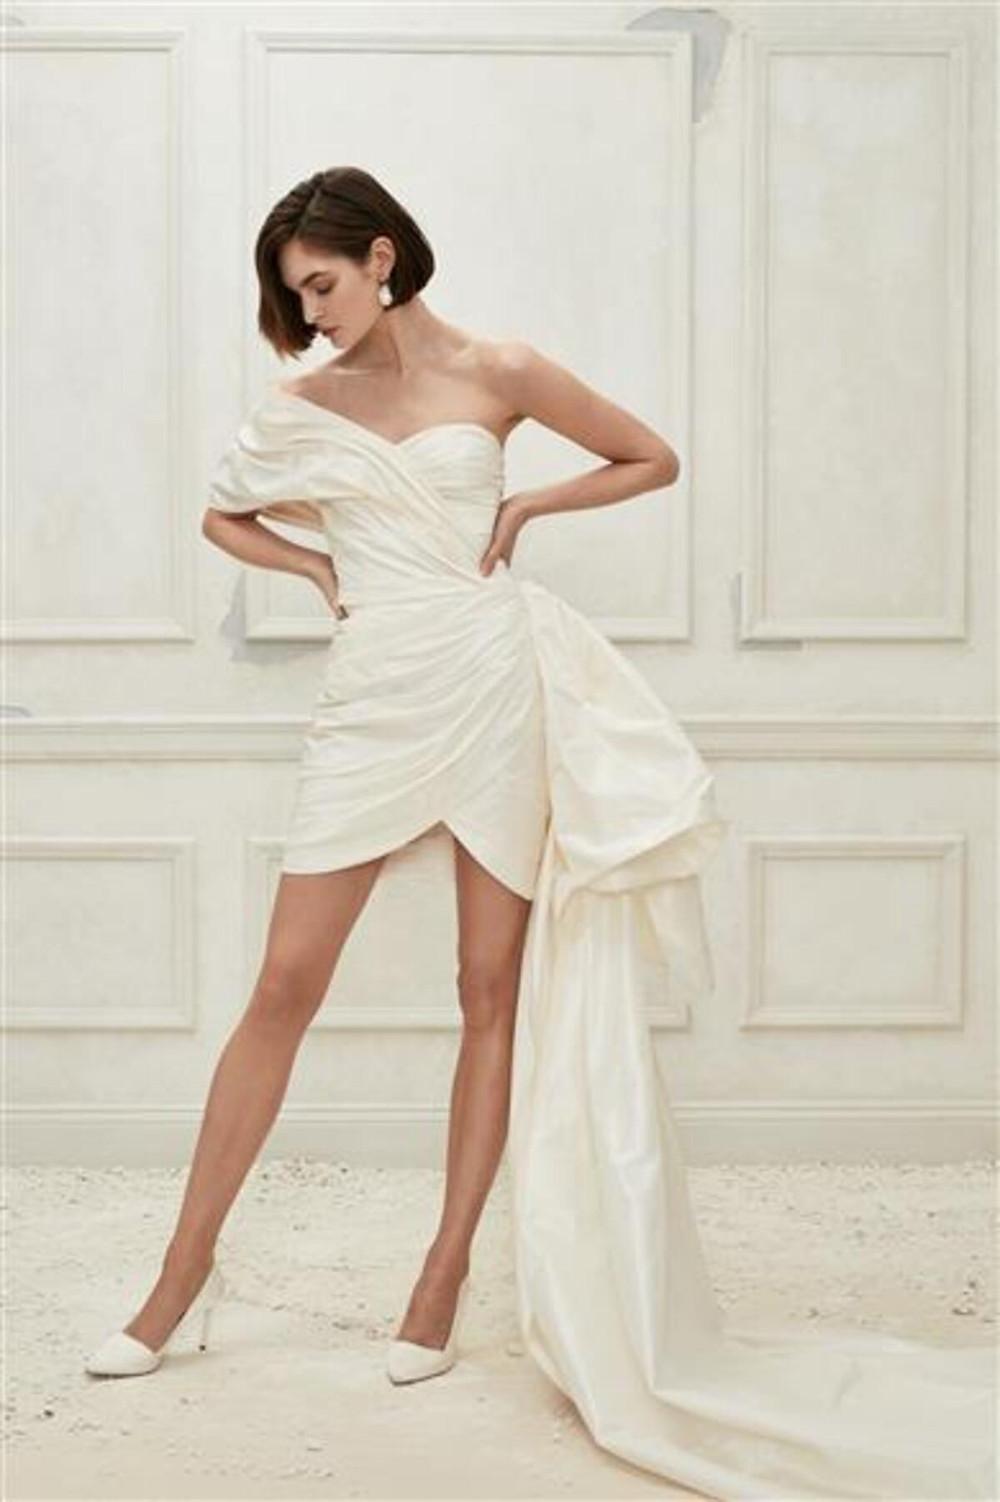 A Oscar de la Renta short one shoulder wedding dress, with a large bow